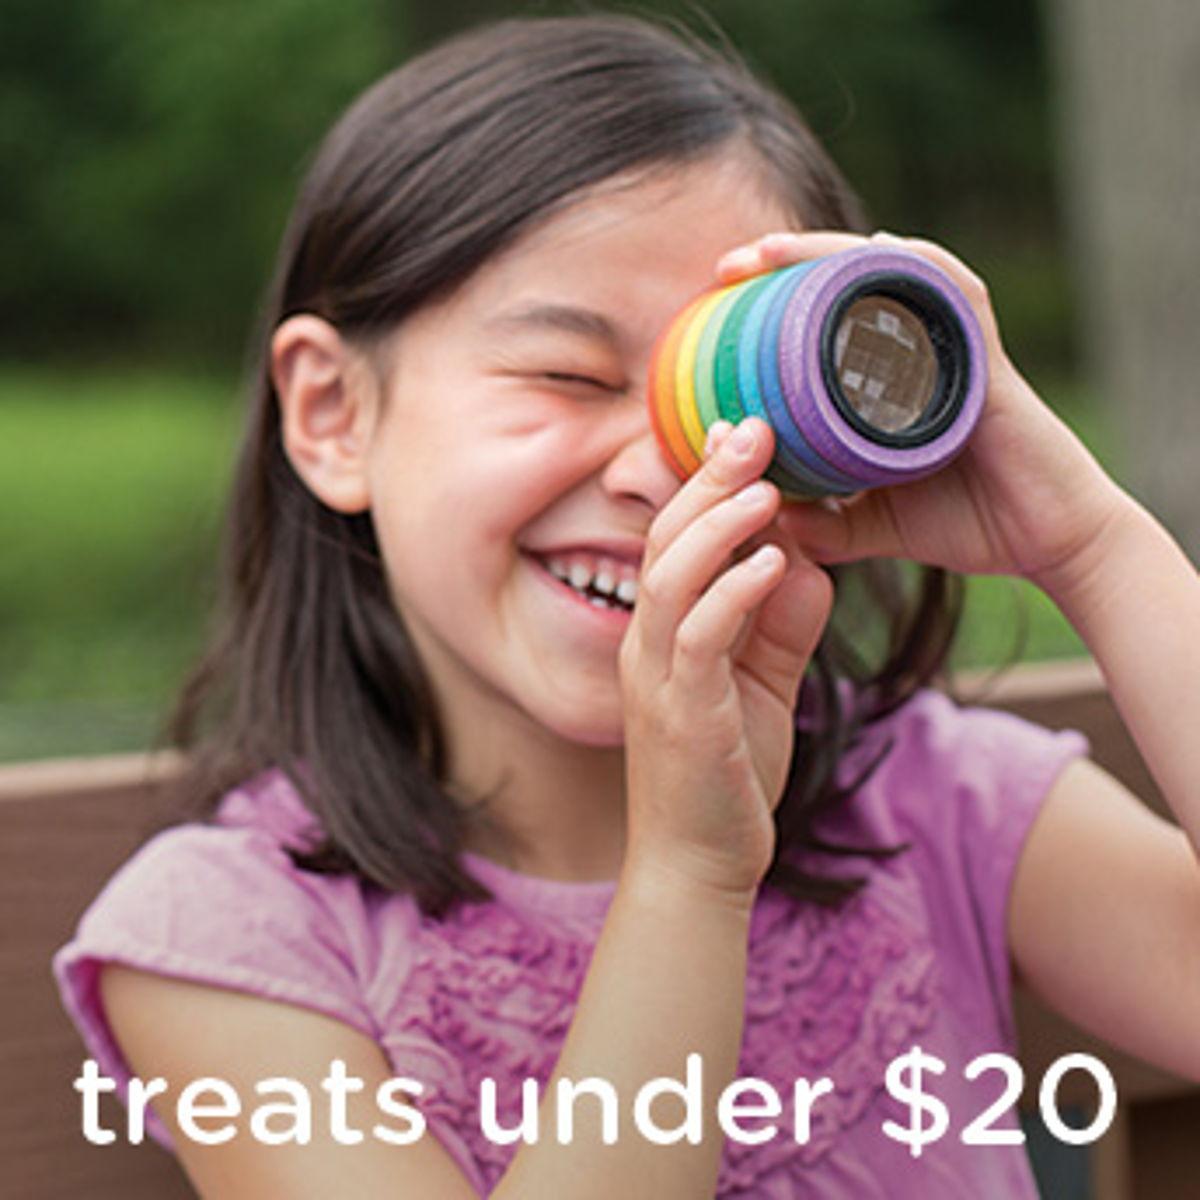 Treats Under $20